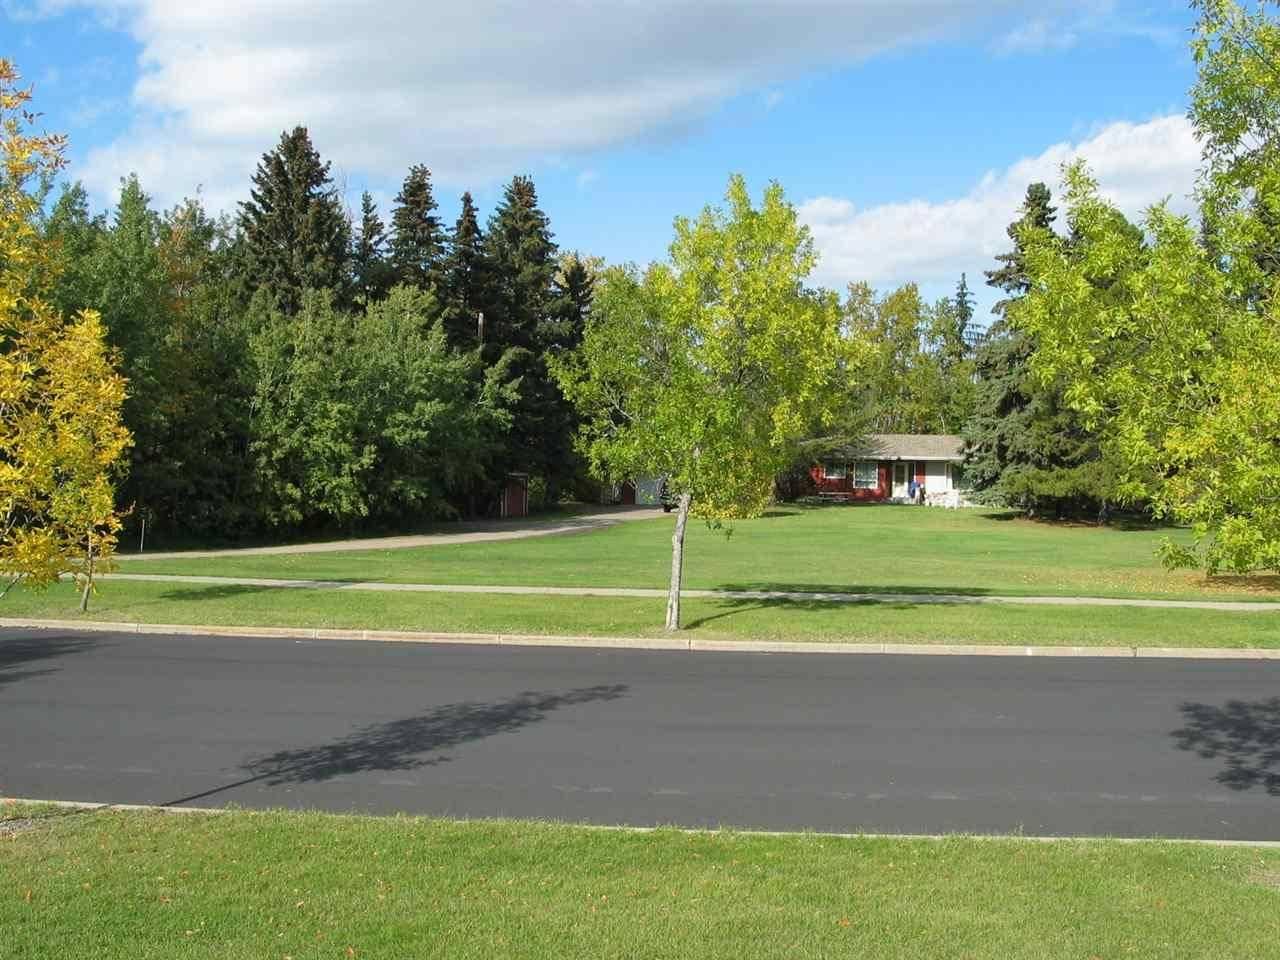 Home for sale at 40 Blackburn Dr Nw Edmonton Alberta - MLS: E4171611